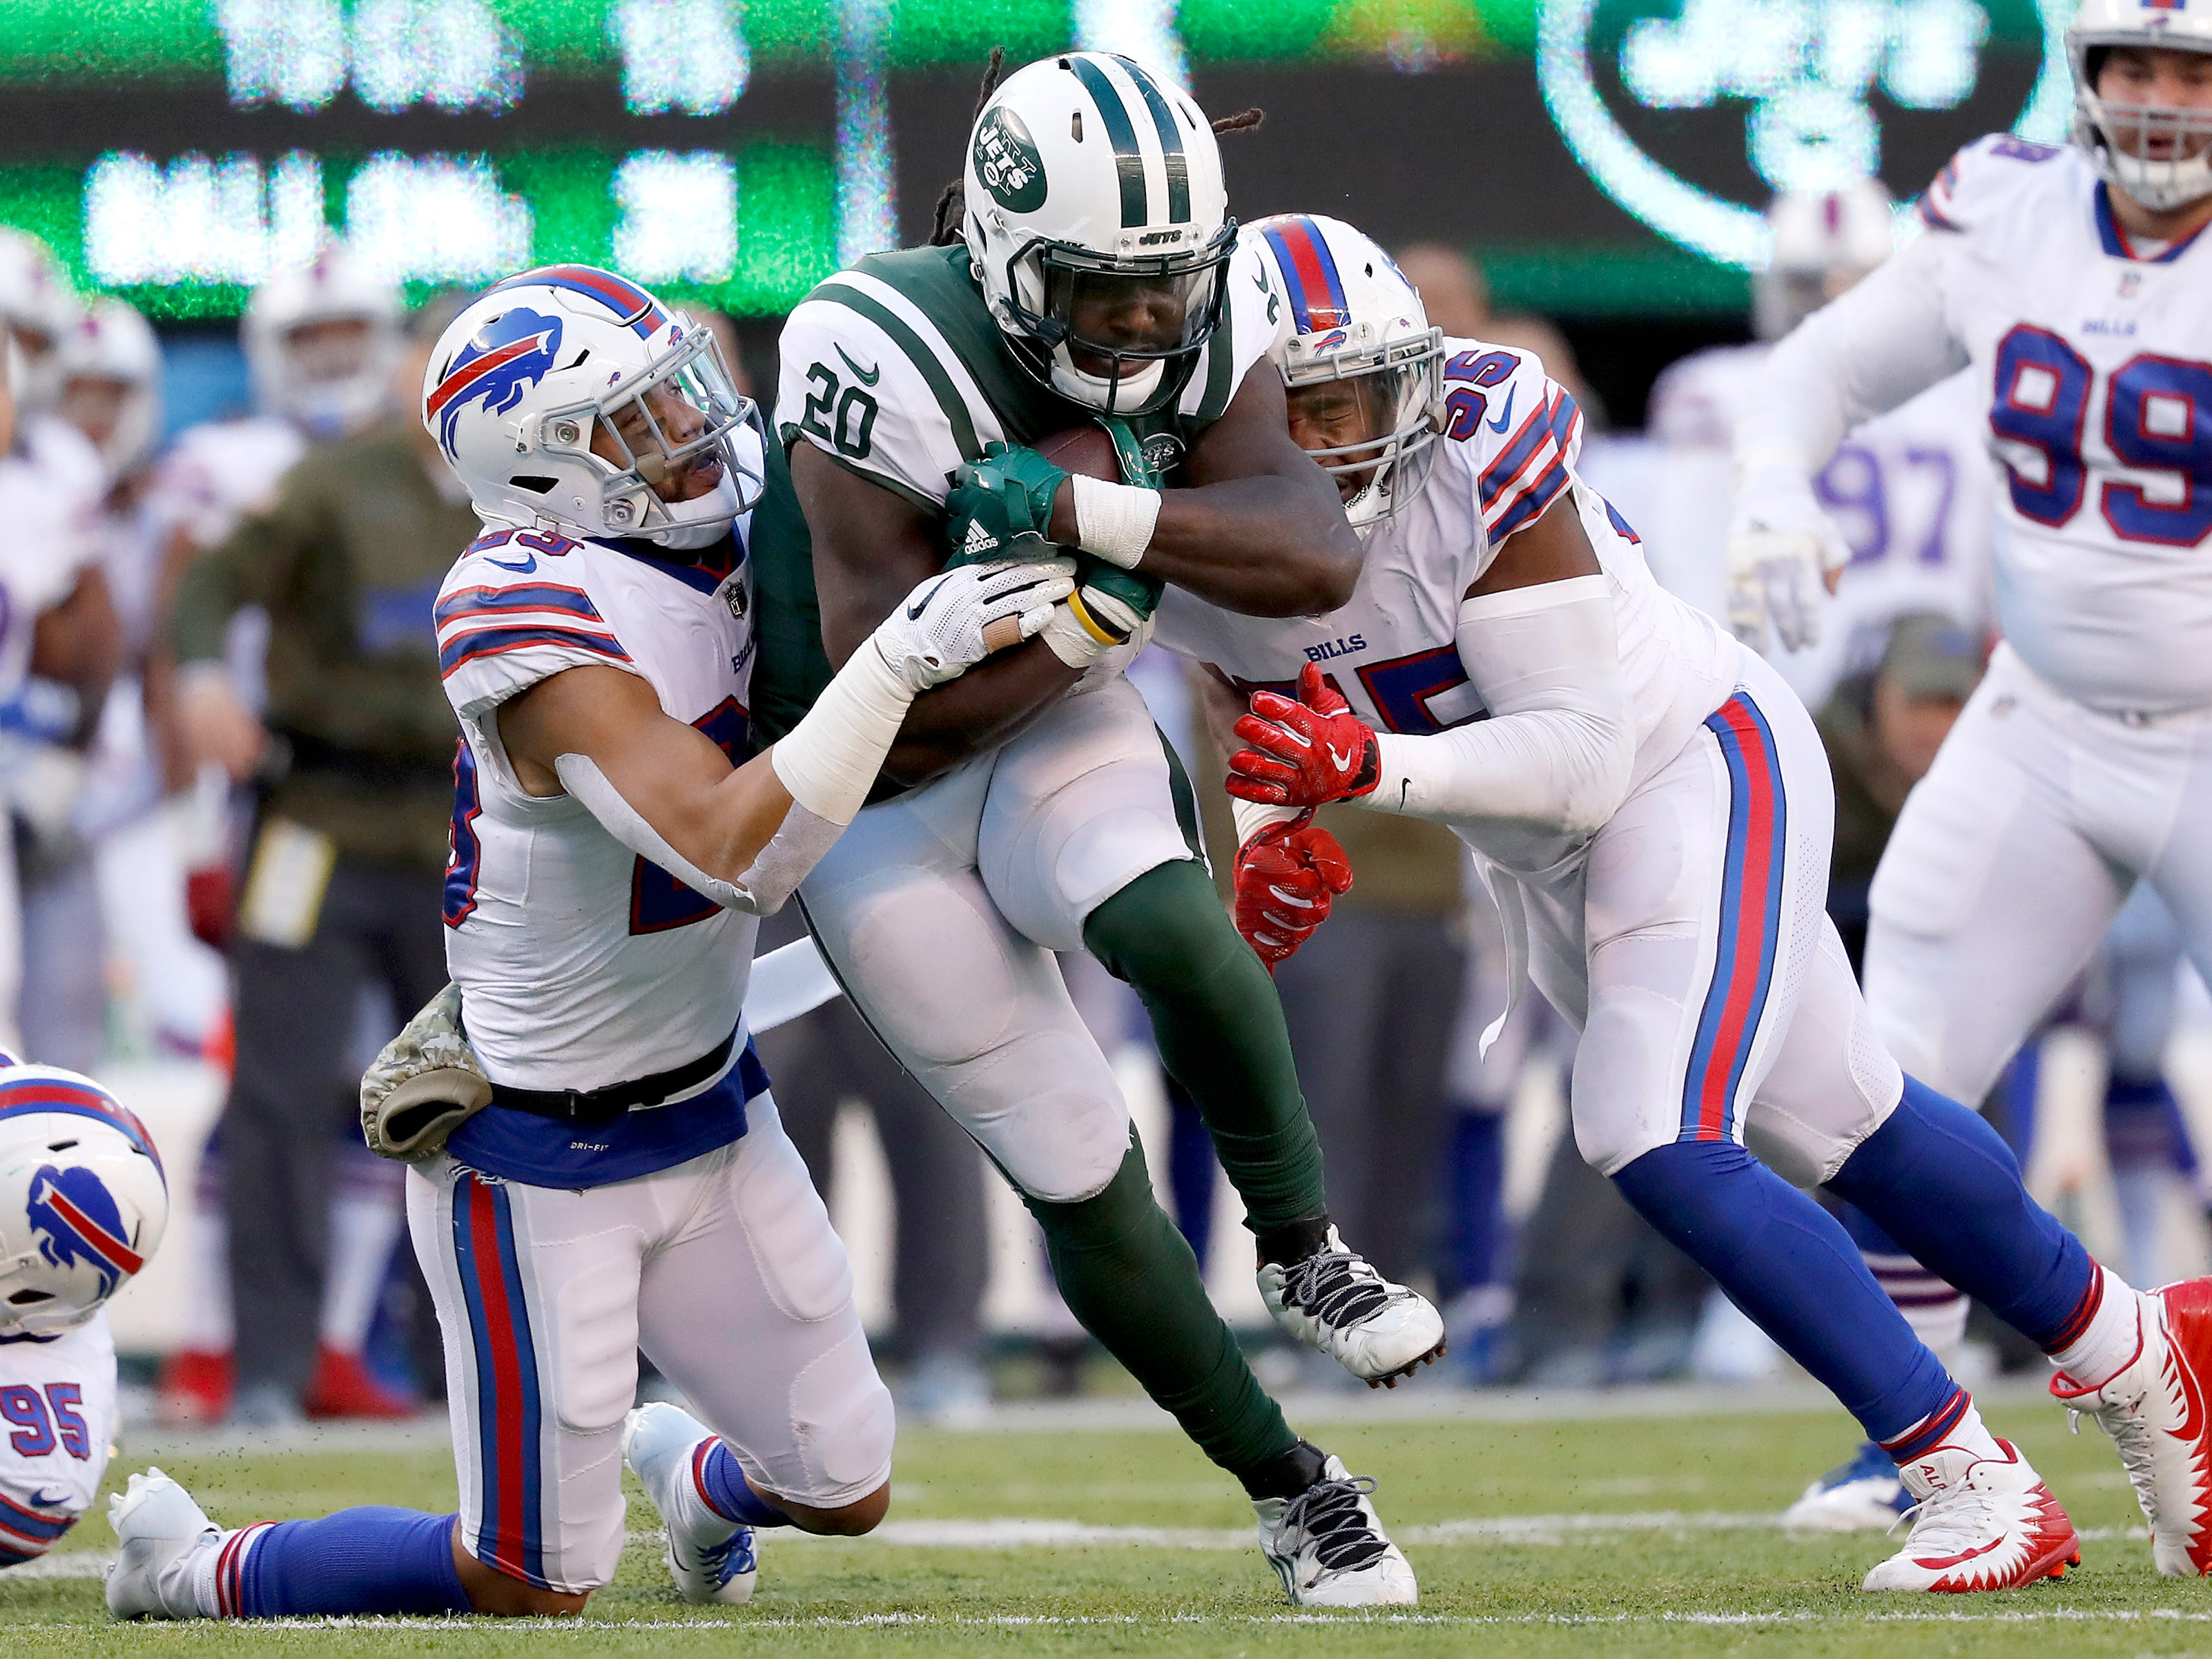 Leo Roth: Can the Buffalo Bills run the table?